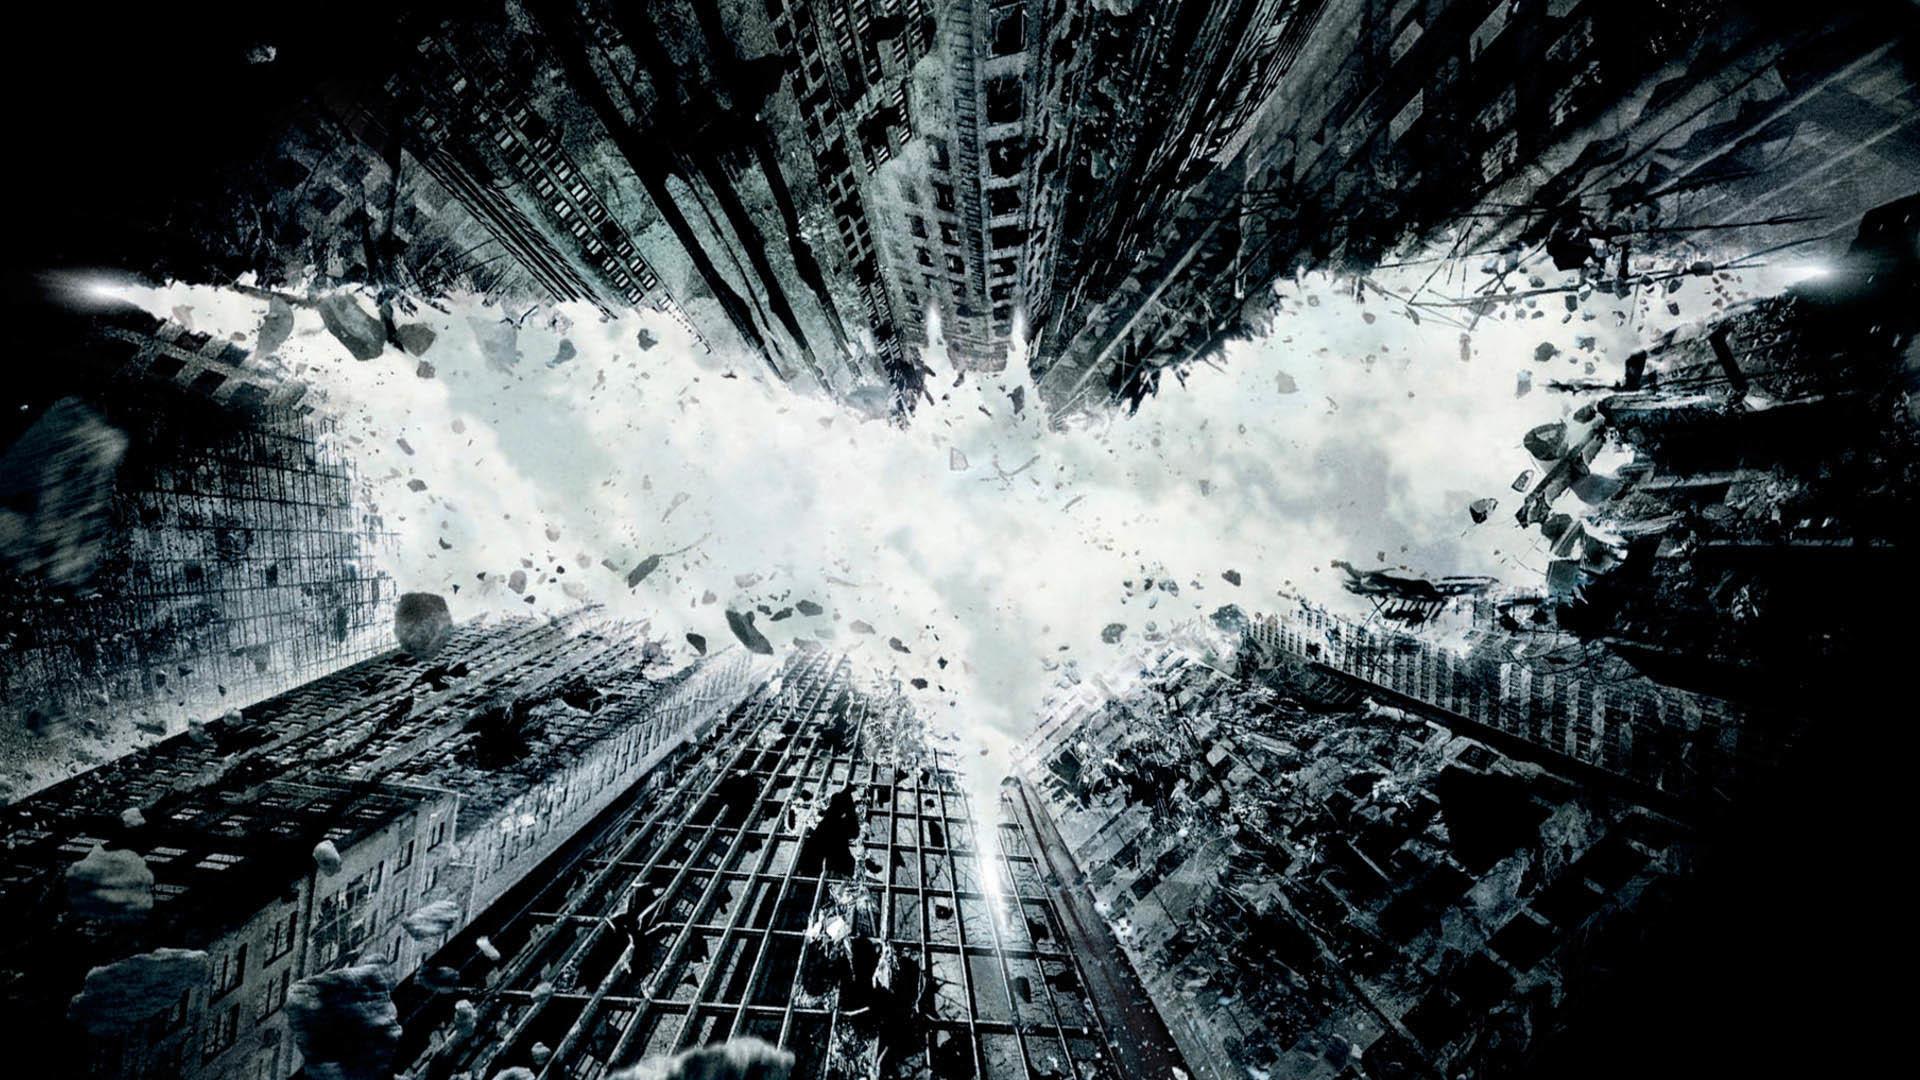 Wallpapers For > The Dark Knight Rises Wallpaper Batman